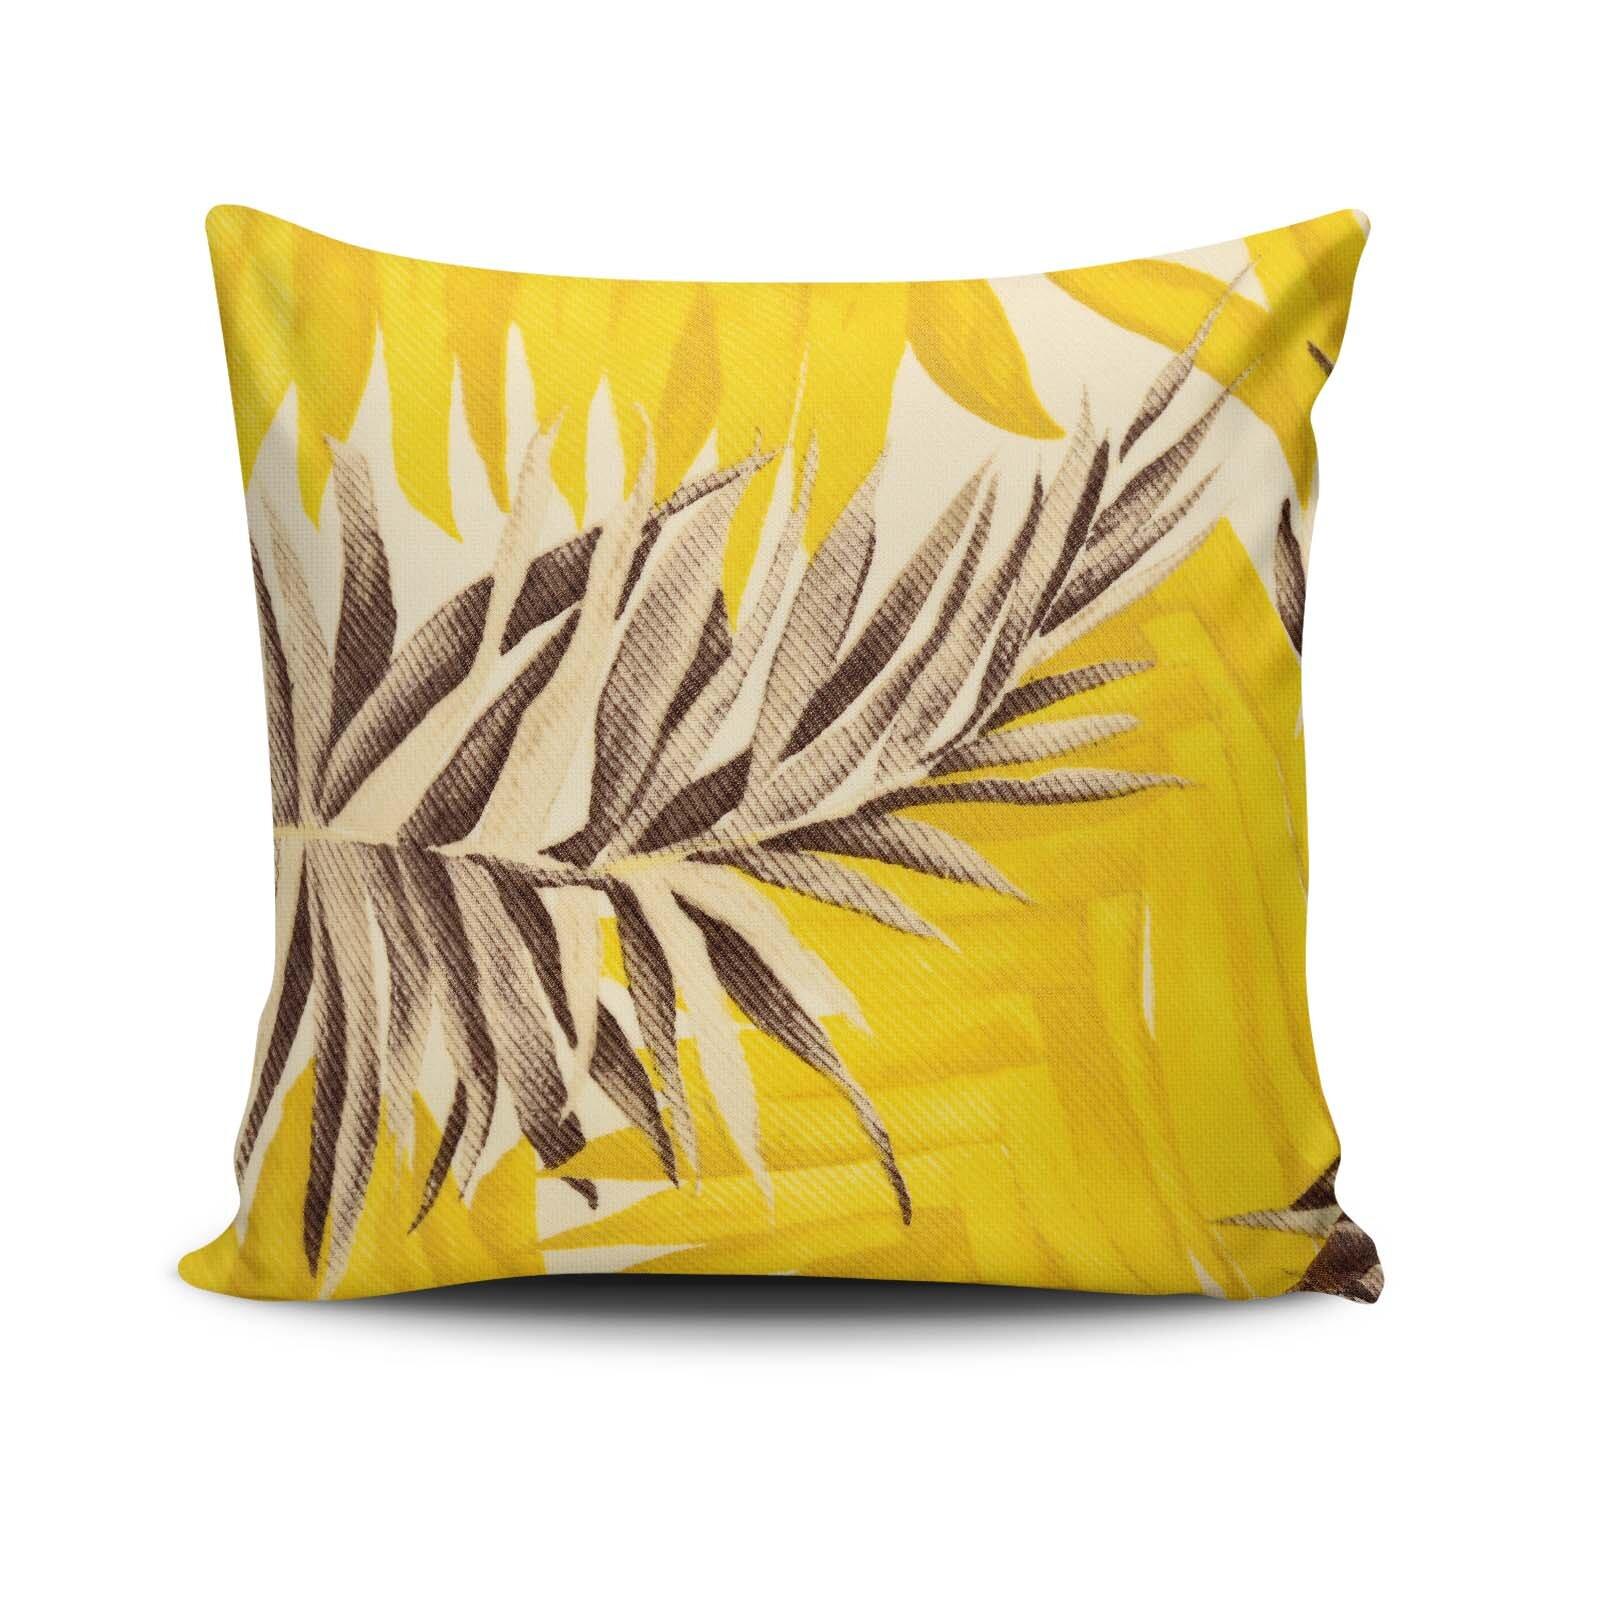 Perna decorativa Cushion Love, Dimensiune: 45 x 45 cm, Material exterior: 50% bumbac / 50% poliester 768CLV0139